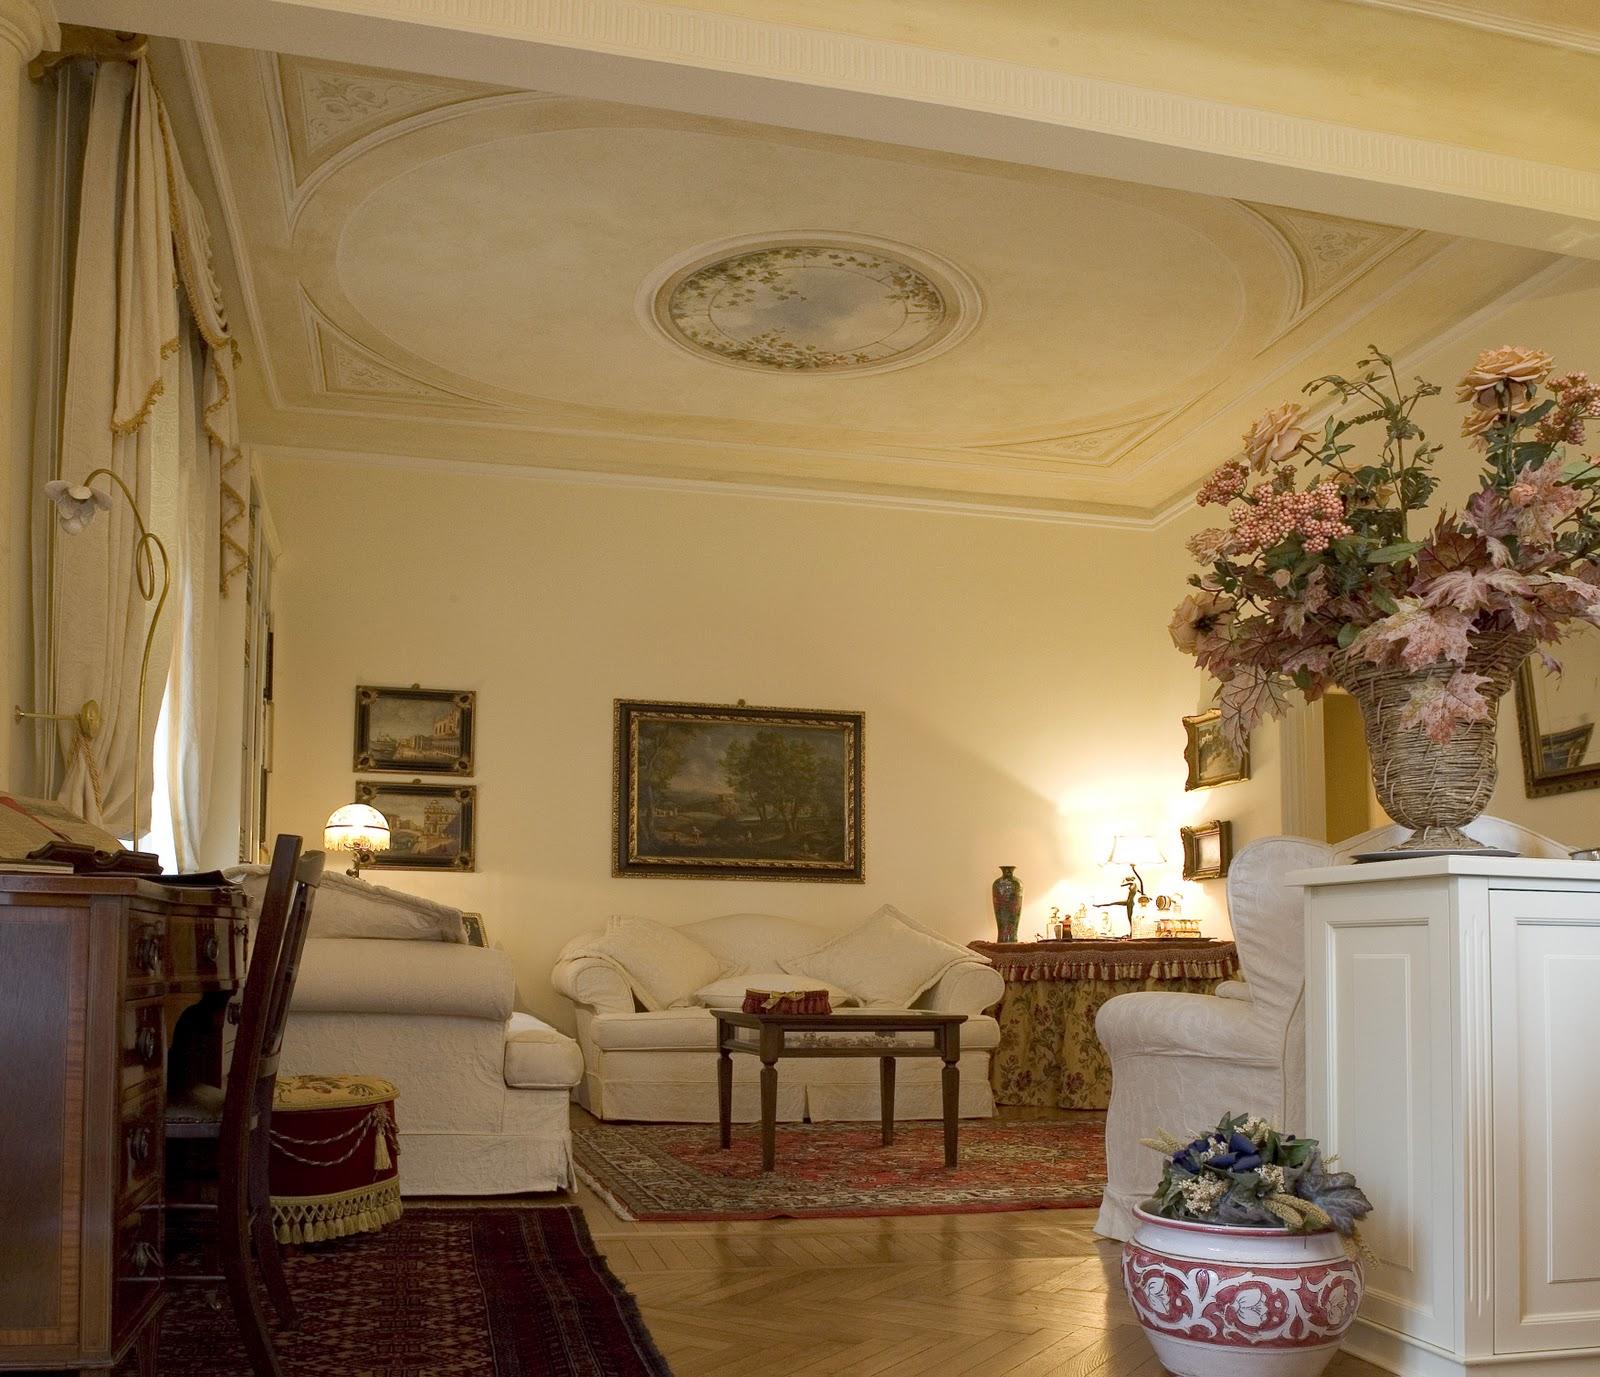 arredamento casa classico e moderno: cucine ariston arrex ... - Arredamento Casa Elegante